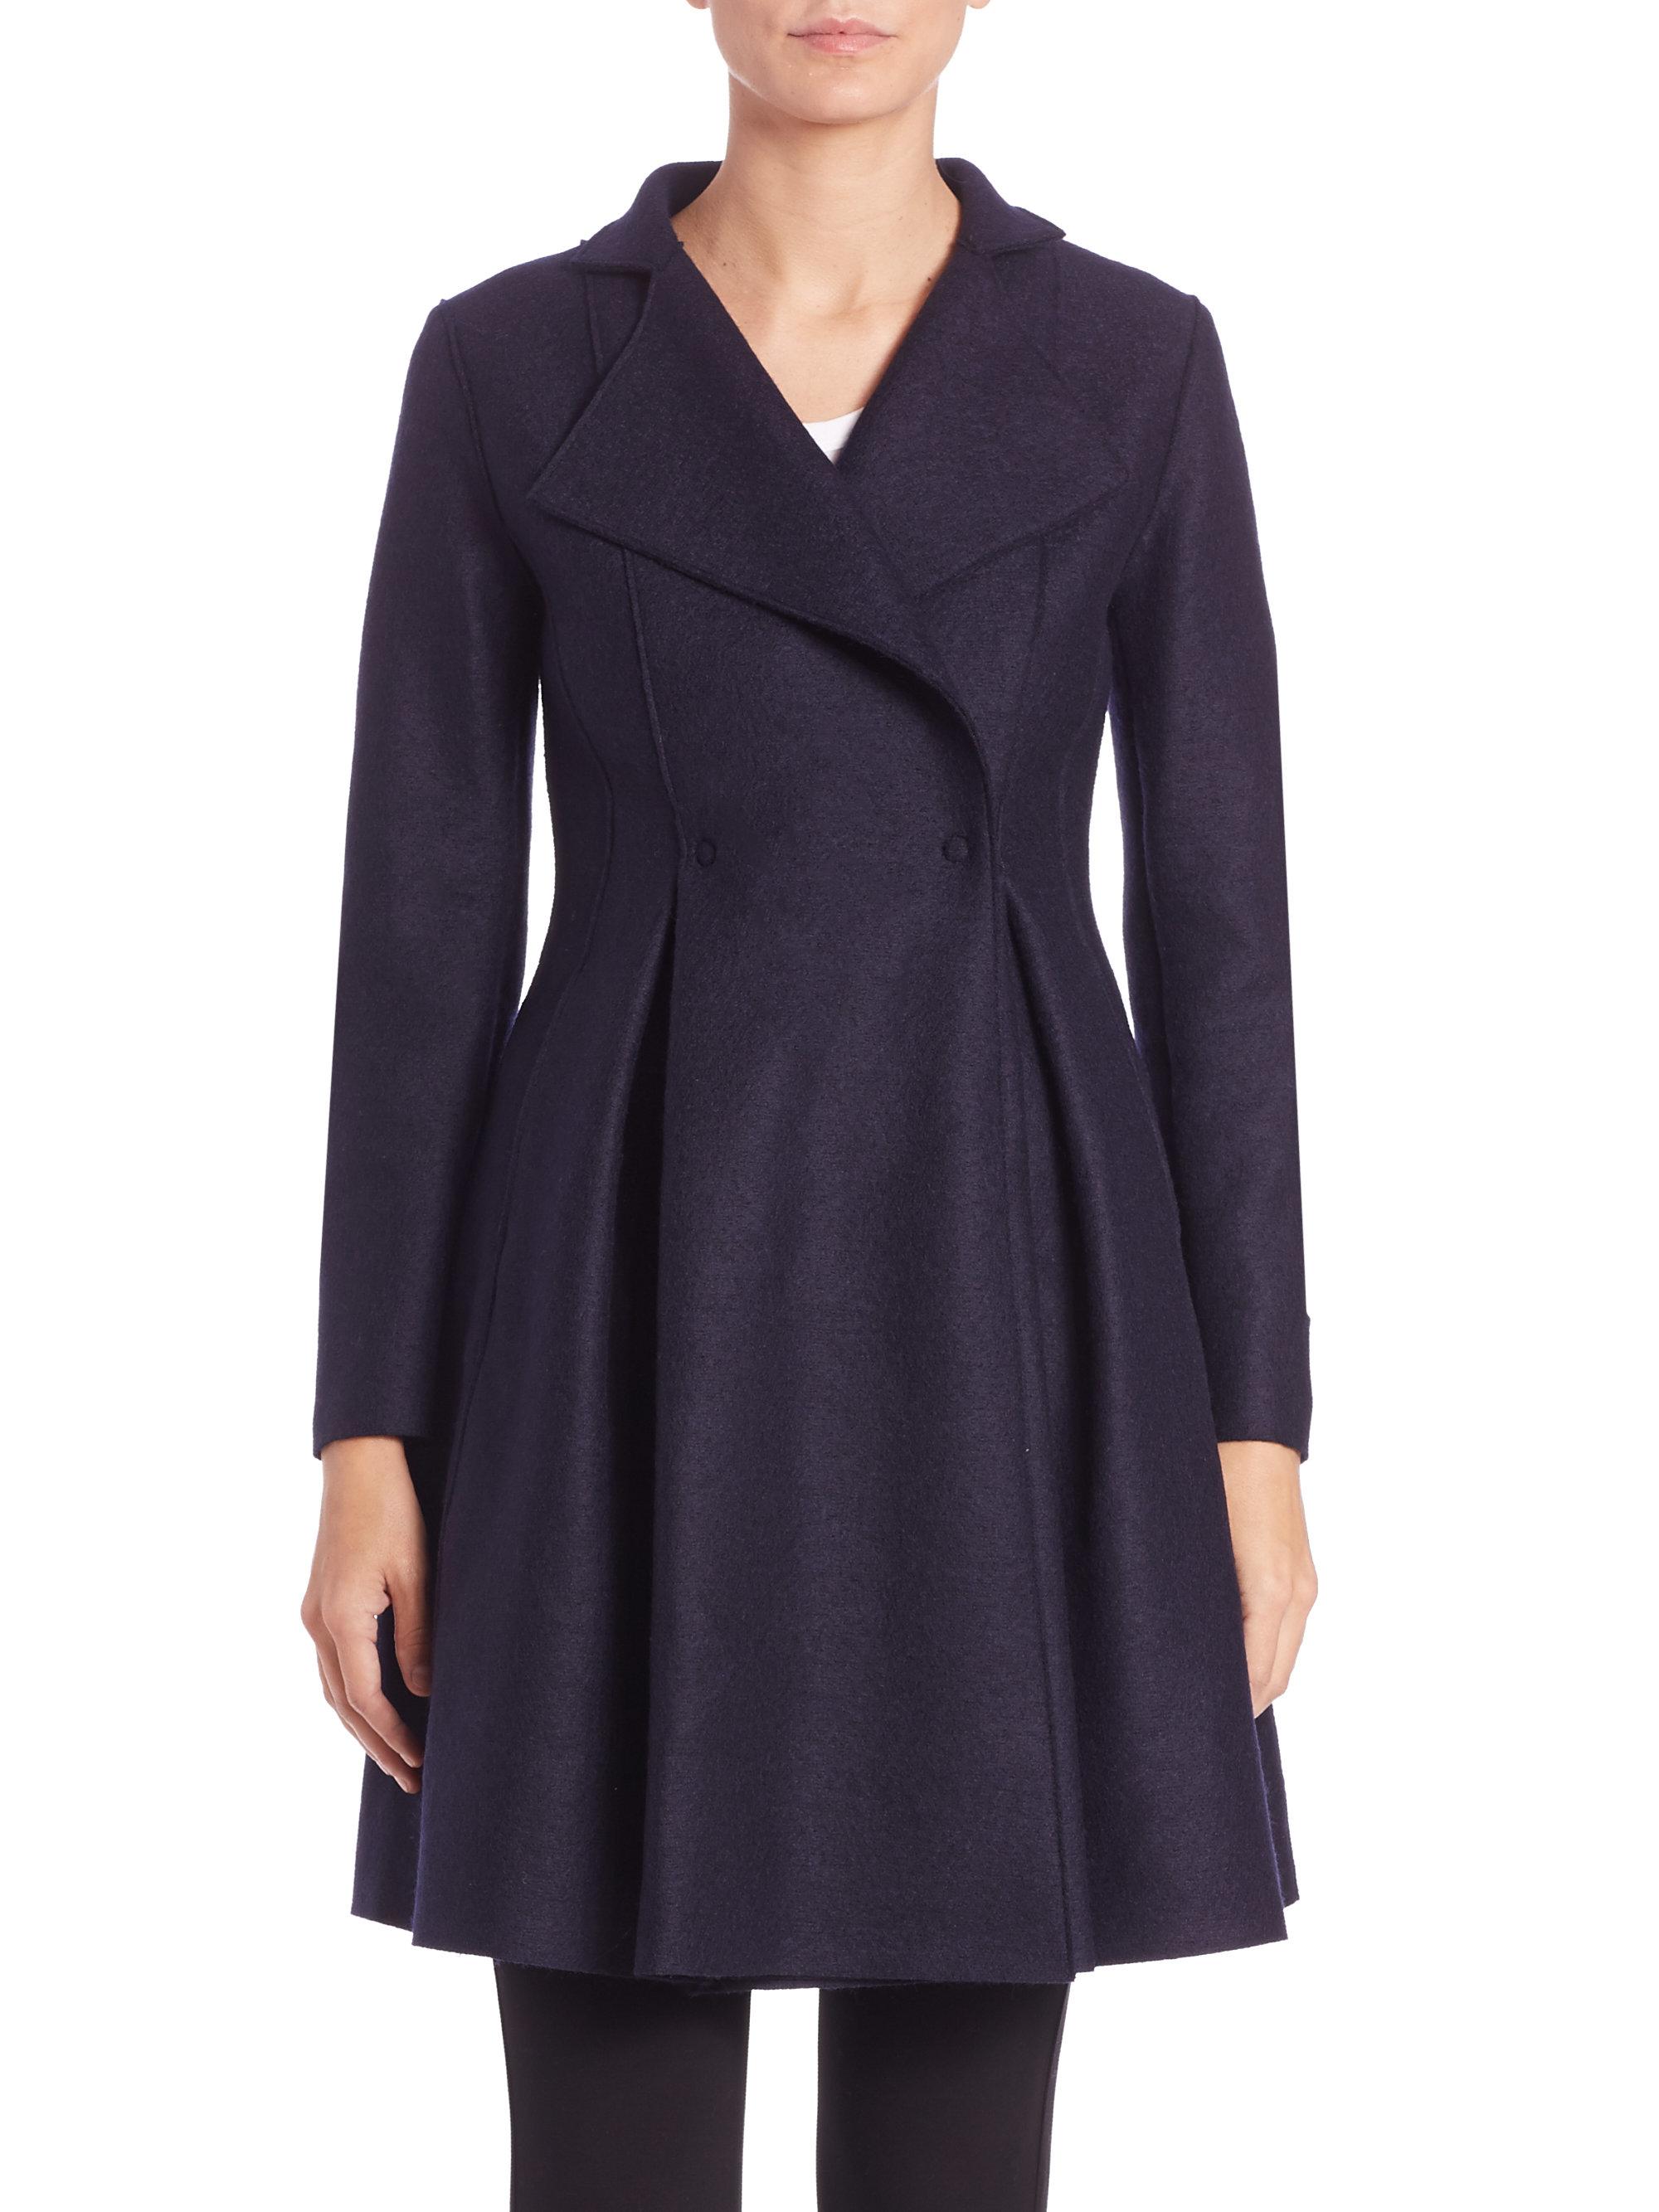 harris wharf london flairy pressed wool coat in blue lyst. Black Bedroom Furniture Sets. Home Design Ideas